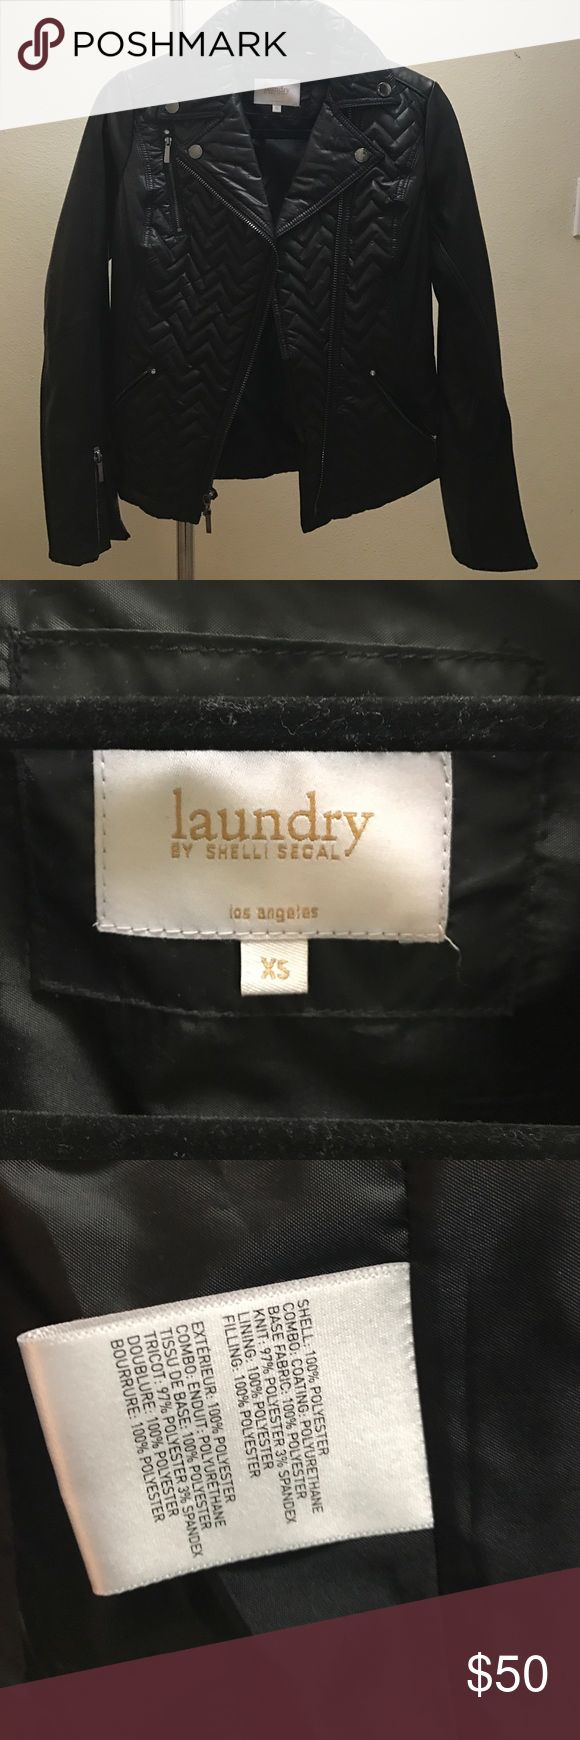 Clearing Closet Black jacket by Laundry Shelli Segal- Never worn Laundry by Shelli Segal Jackets & Coats Puffers